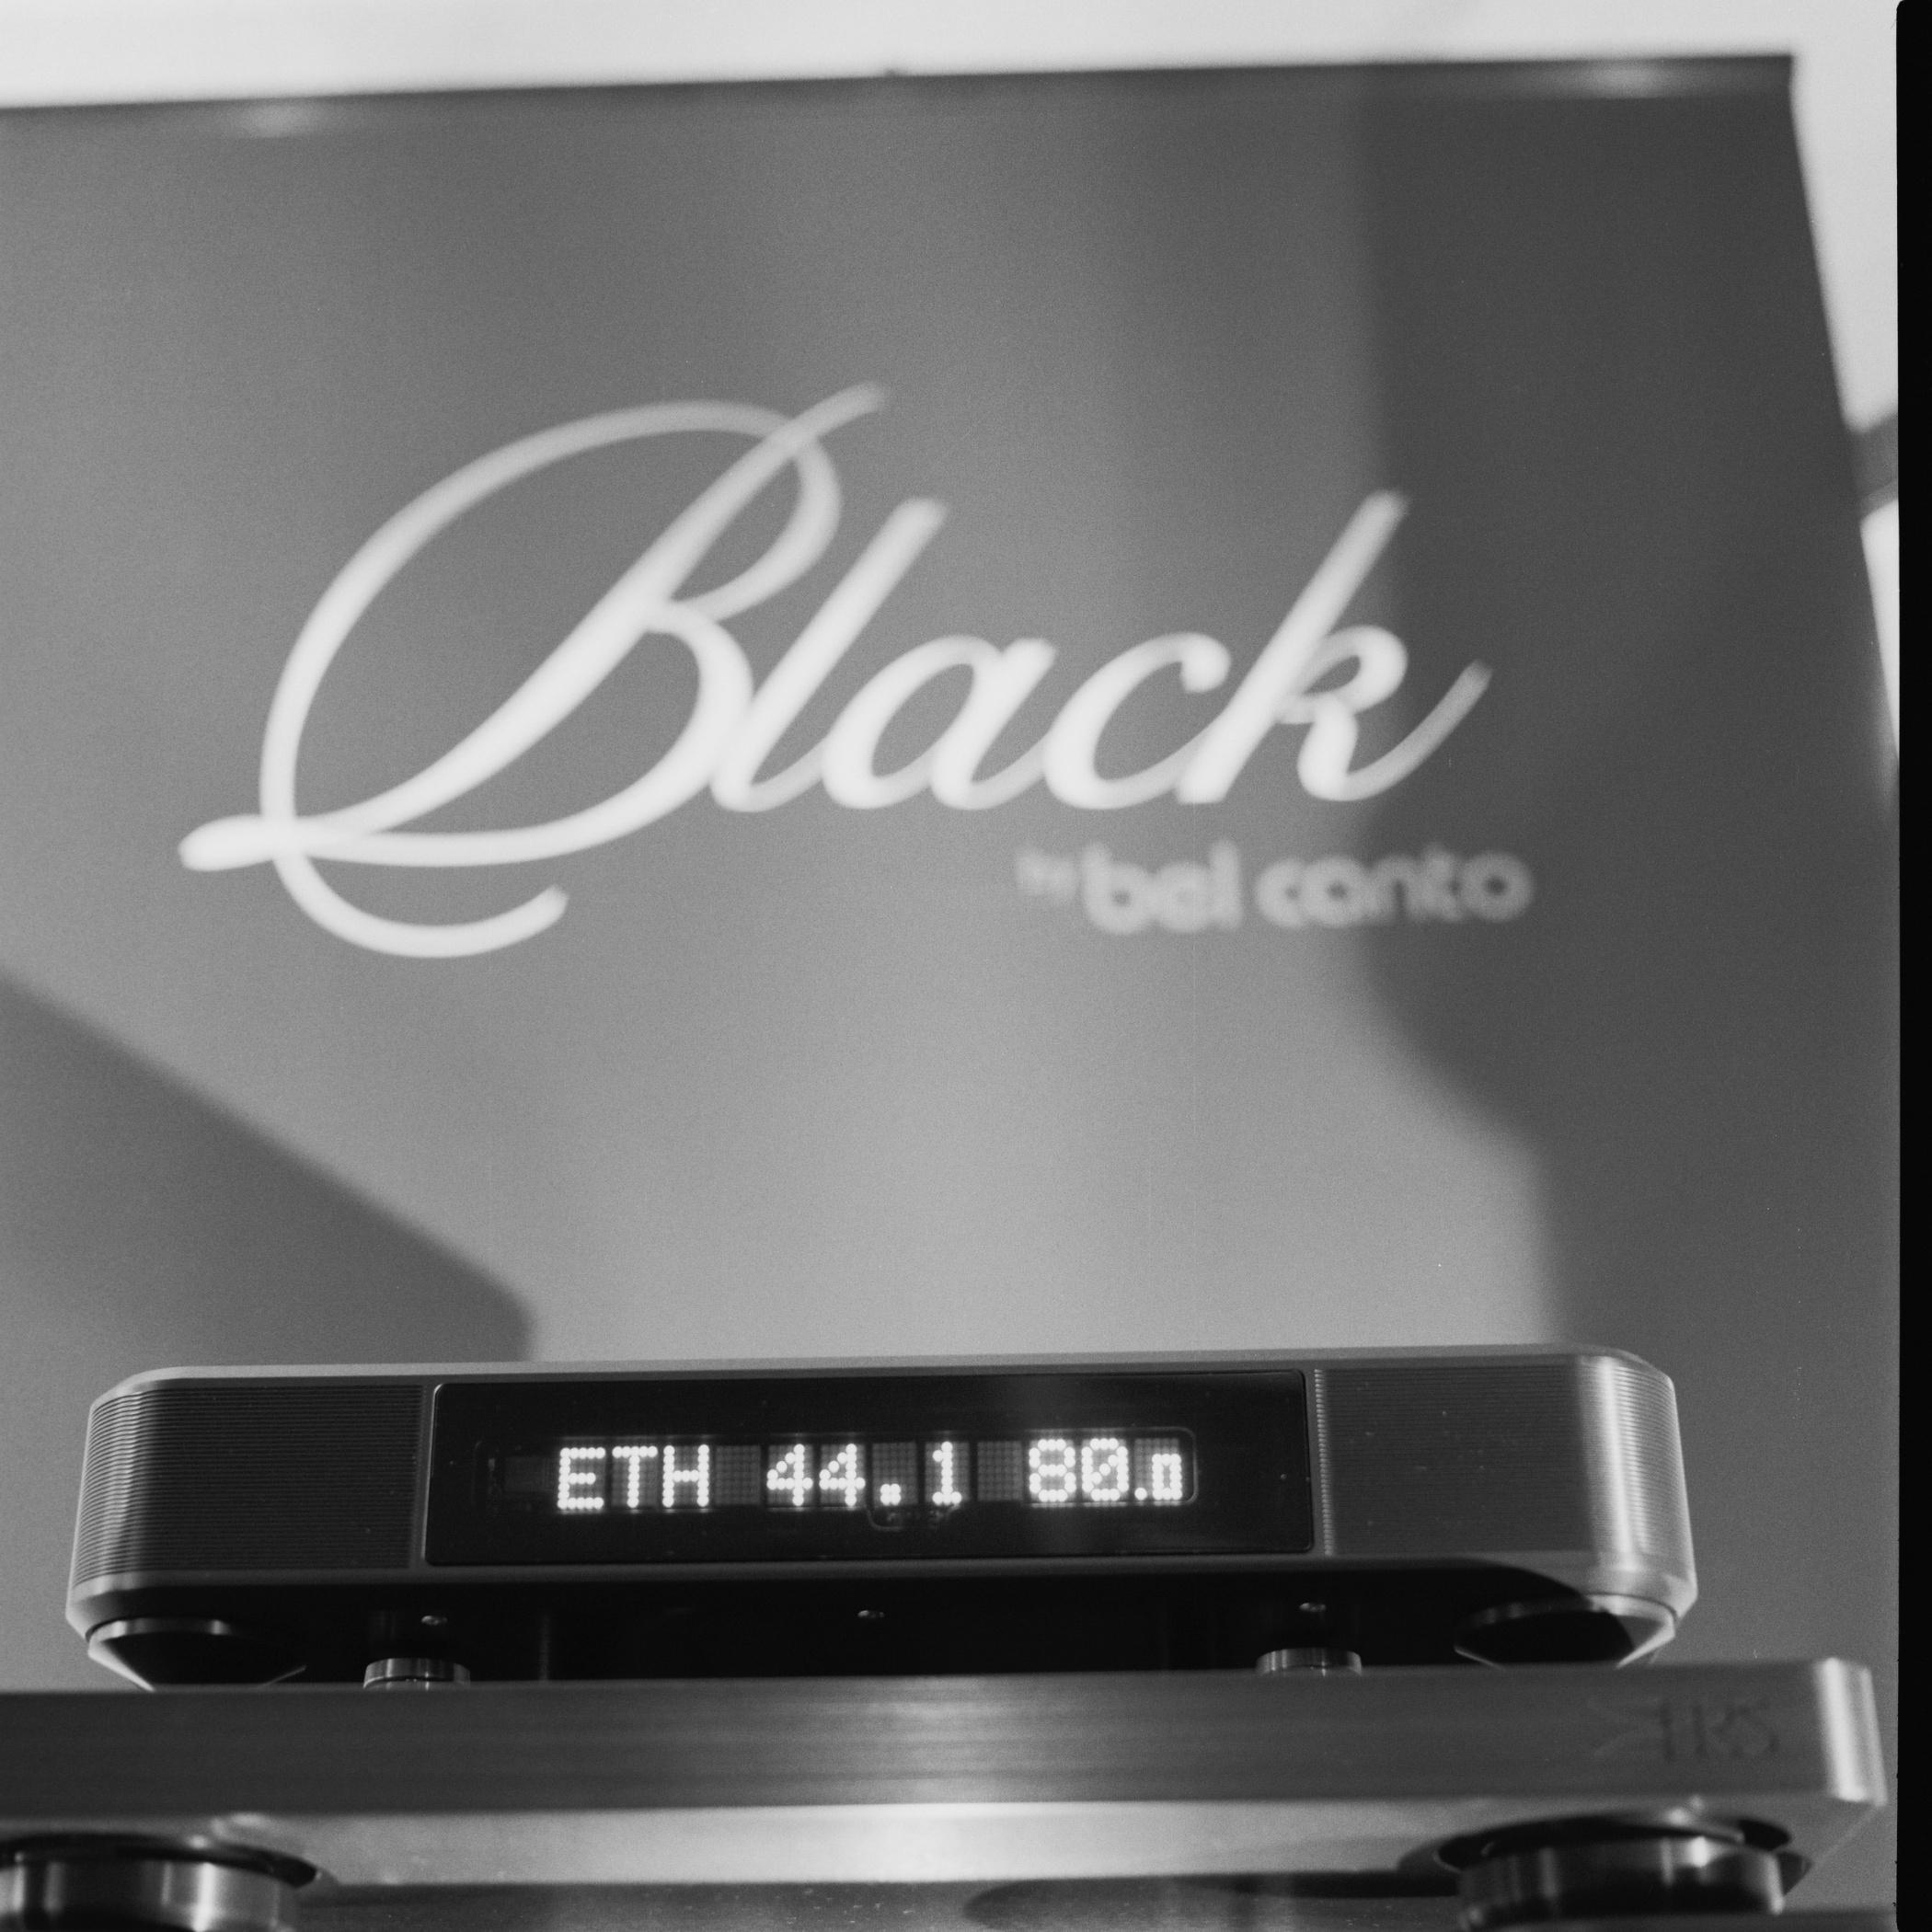 2013-Hasselblad-Black-01